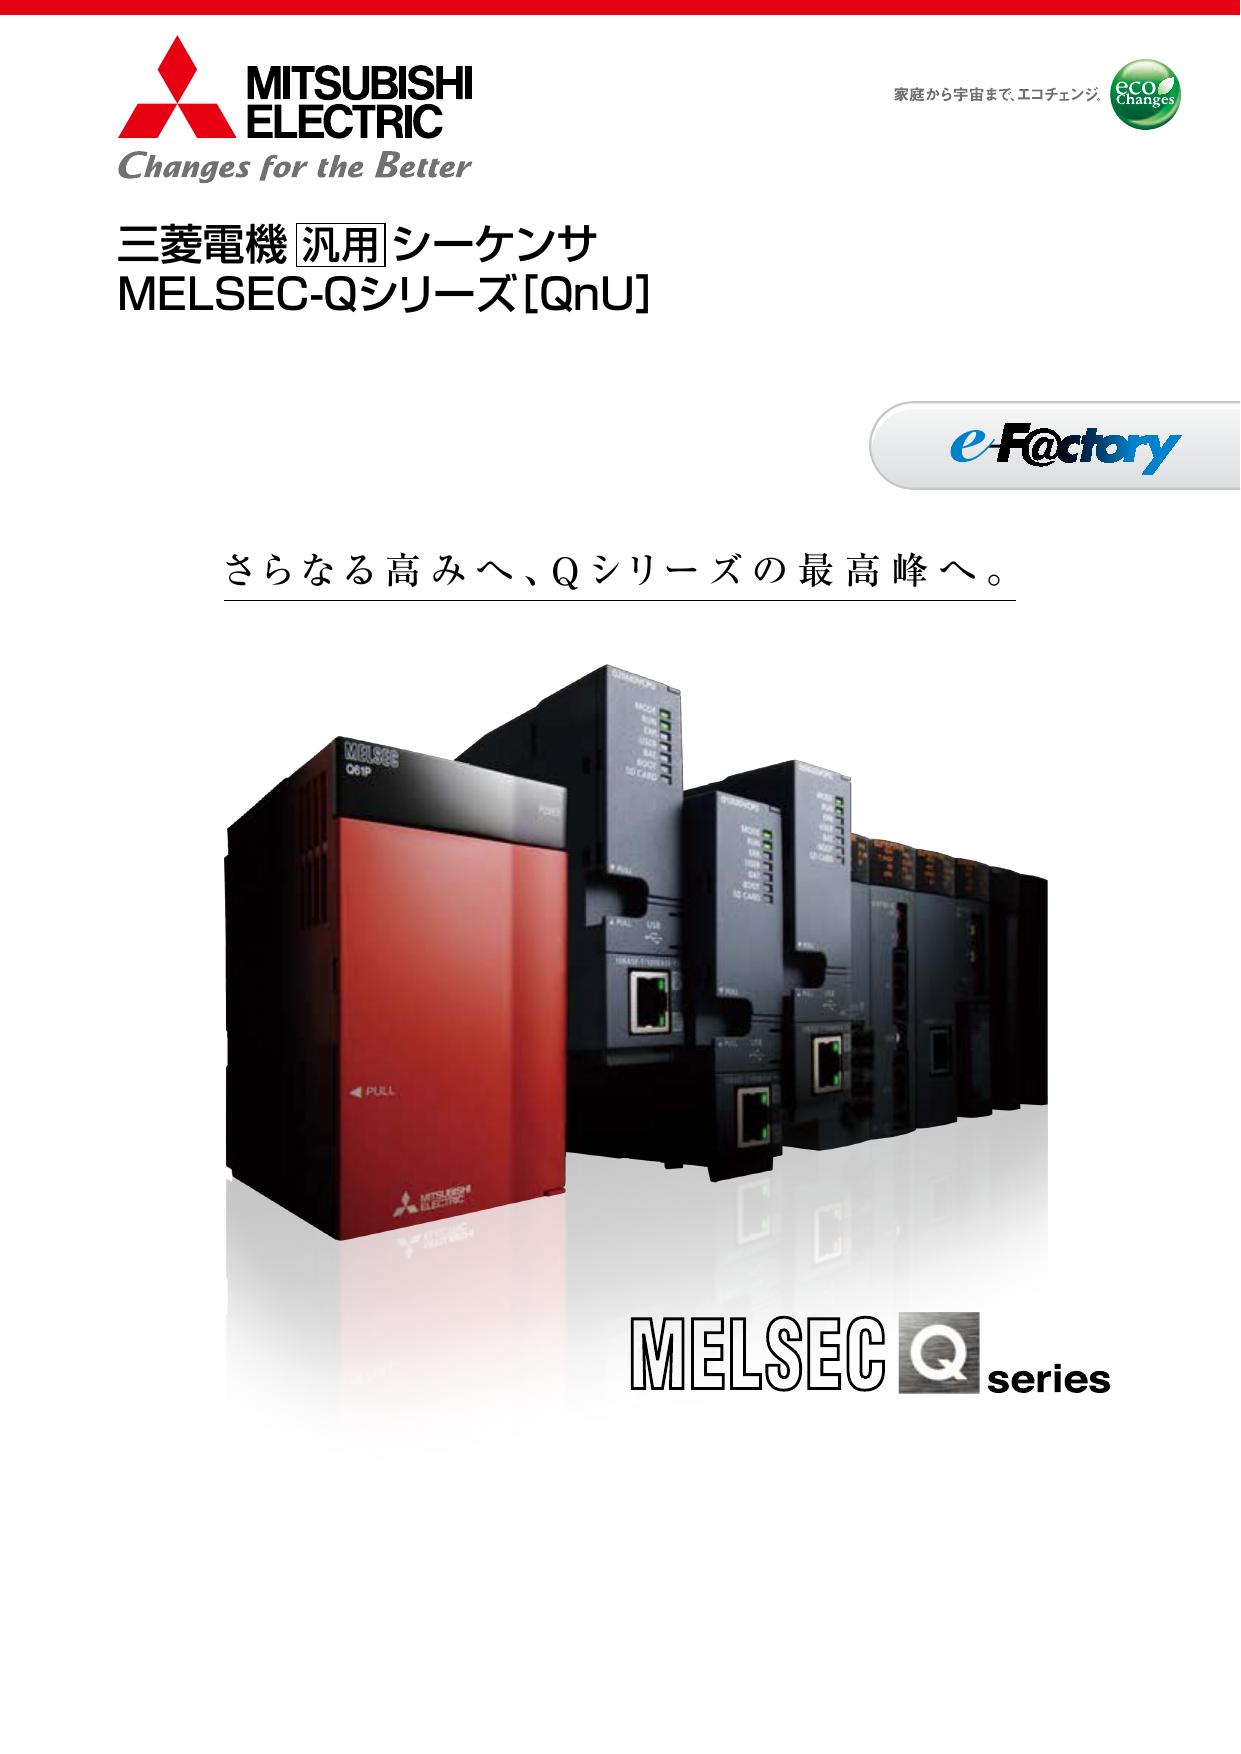 melsec a シリーズ マニュアル